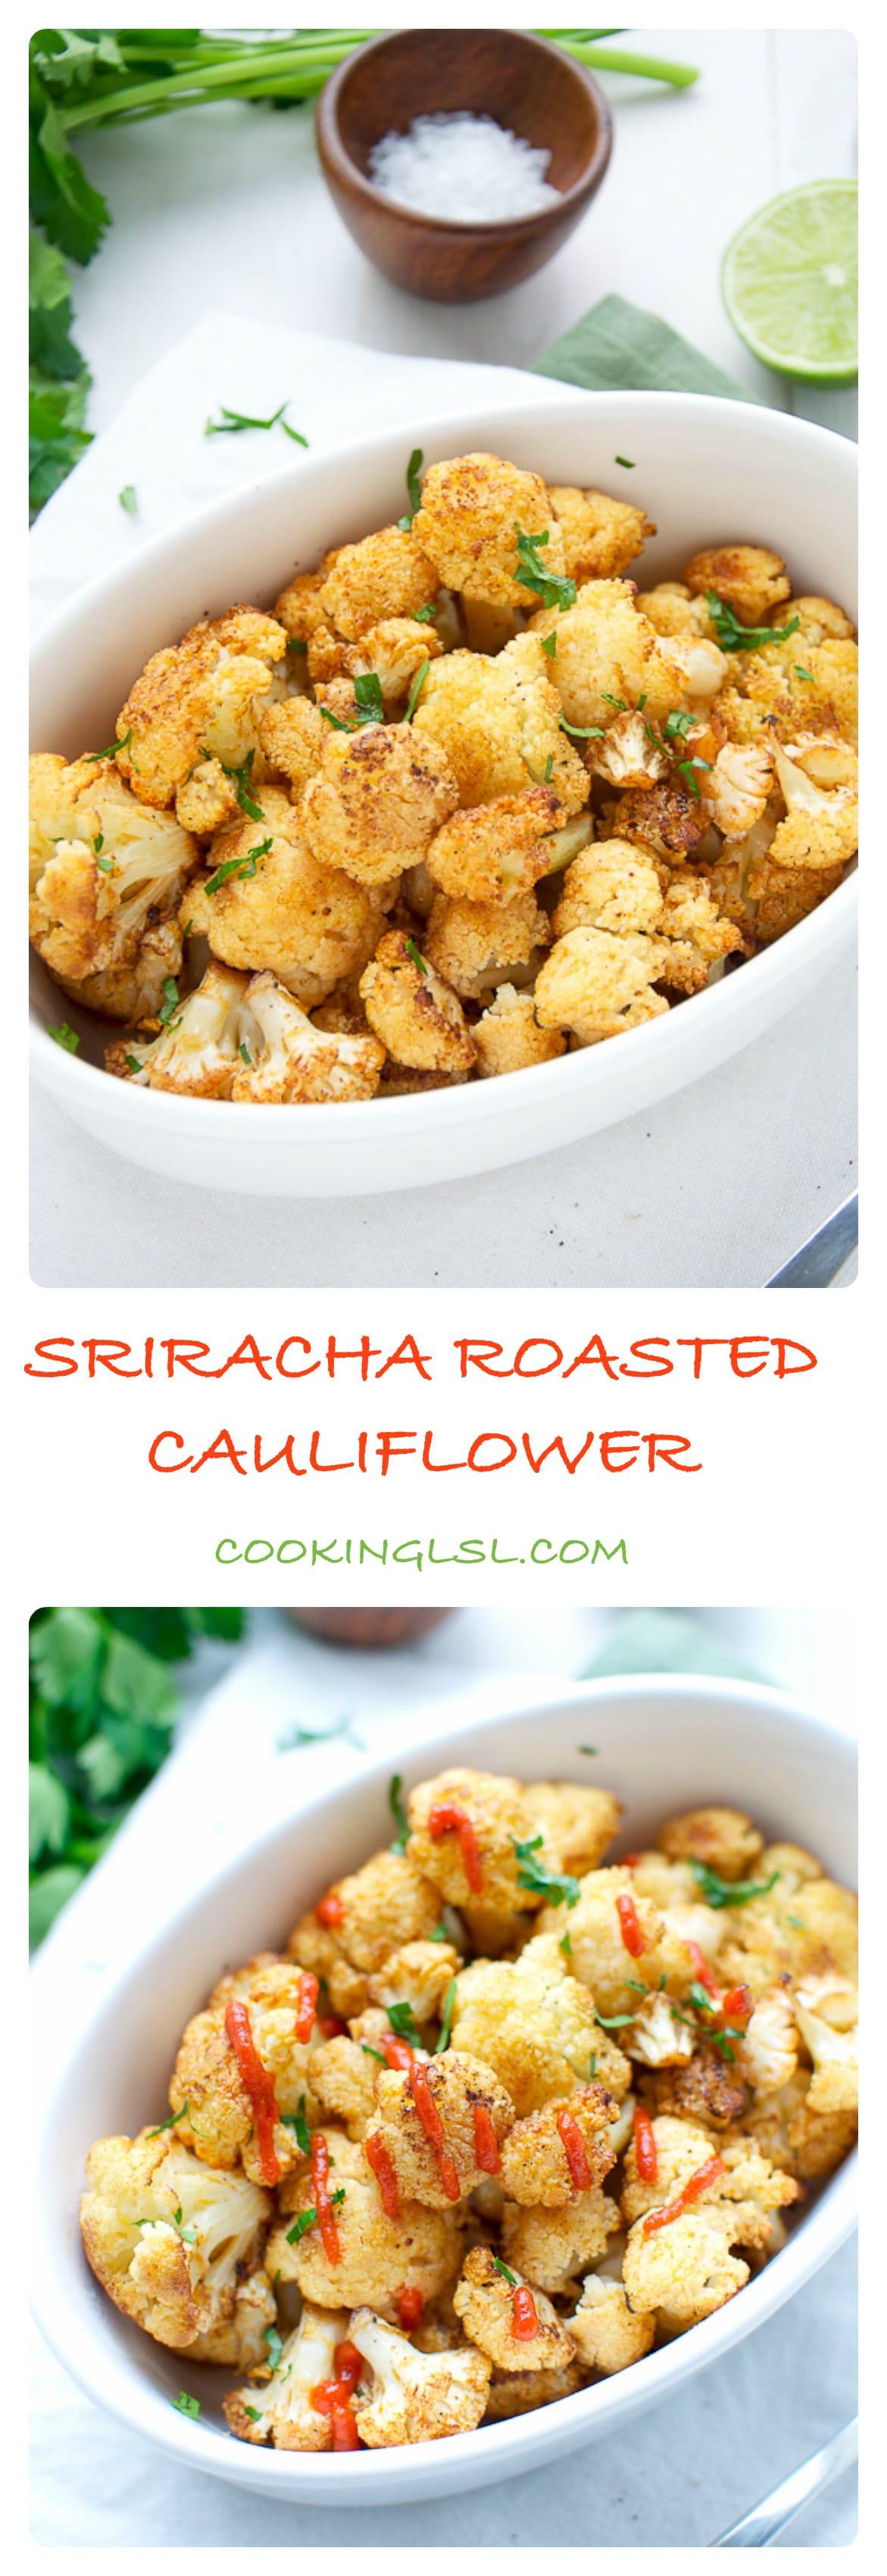 sriracha-roasted-cauliflower